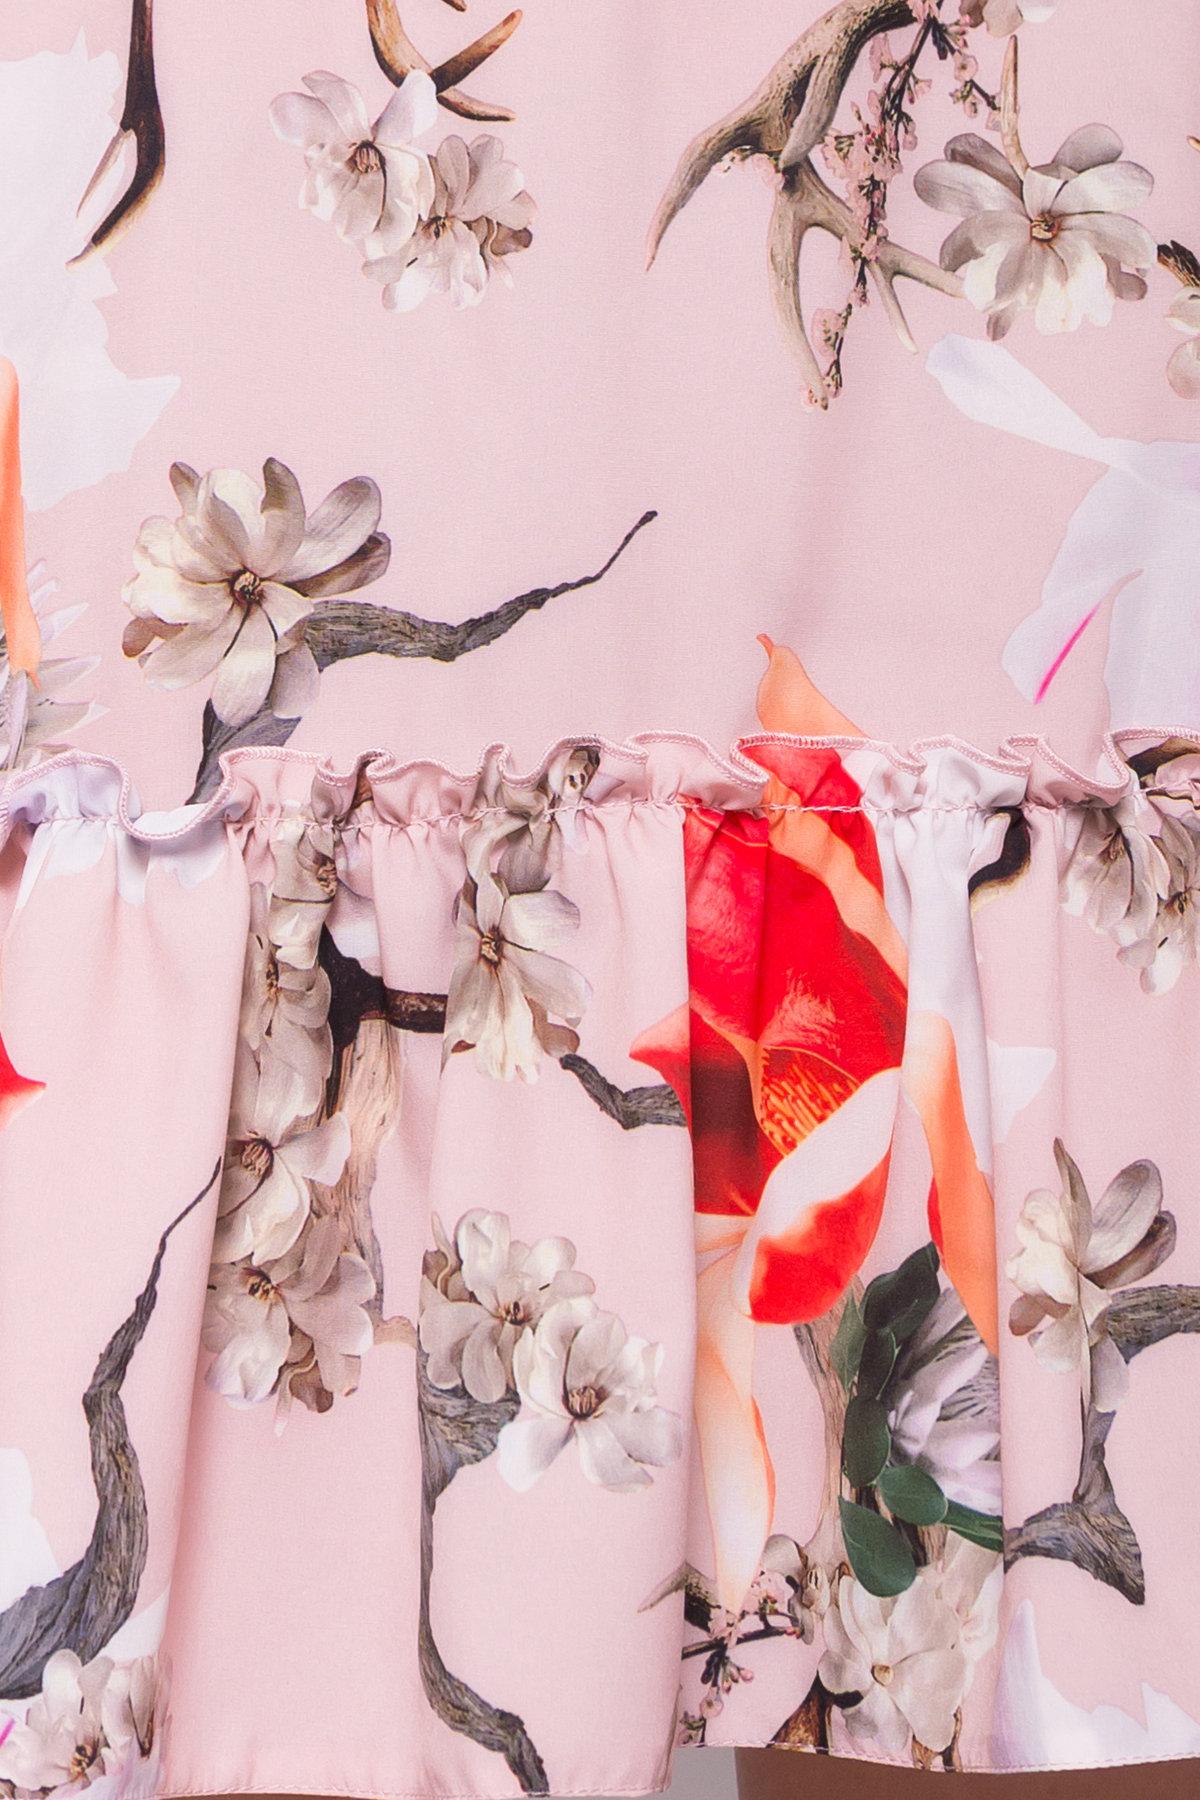 Платье Флеа 7112 АРТ. 42796 Цвет: цветы комби пудра/ коралл - фото 4, интернет магазин tm-modus.ru